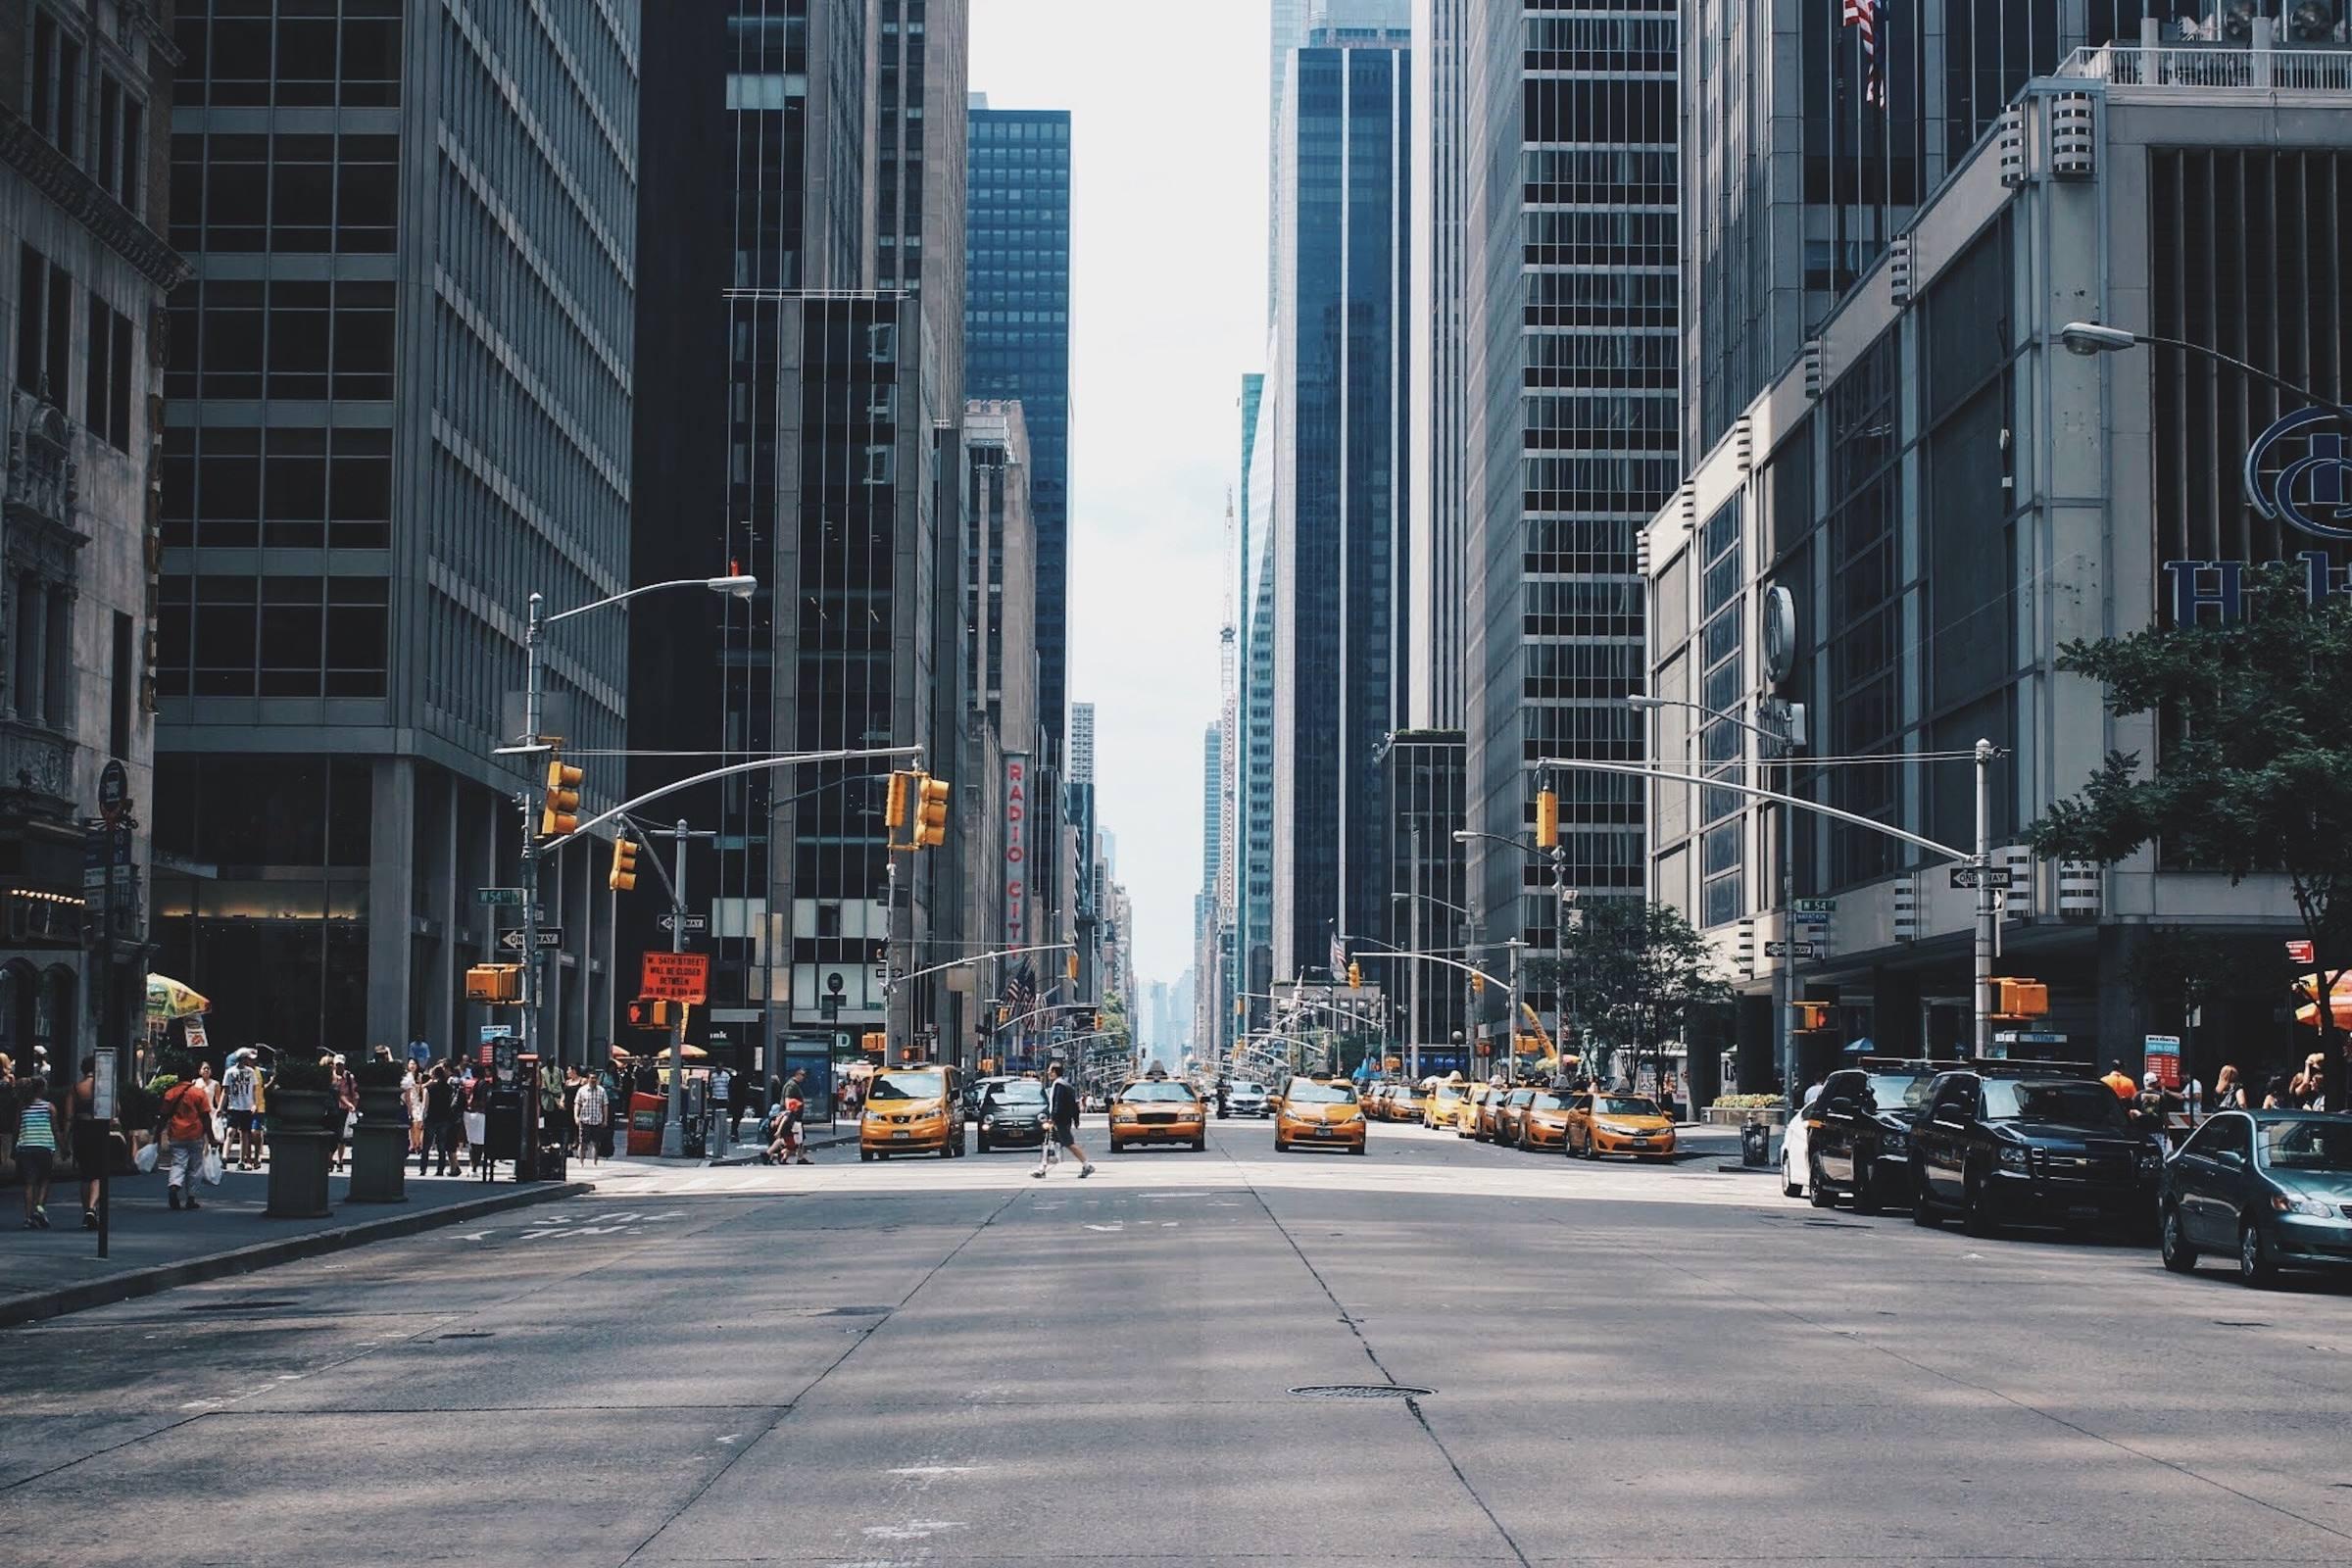 new york city street yellow cabs